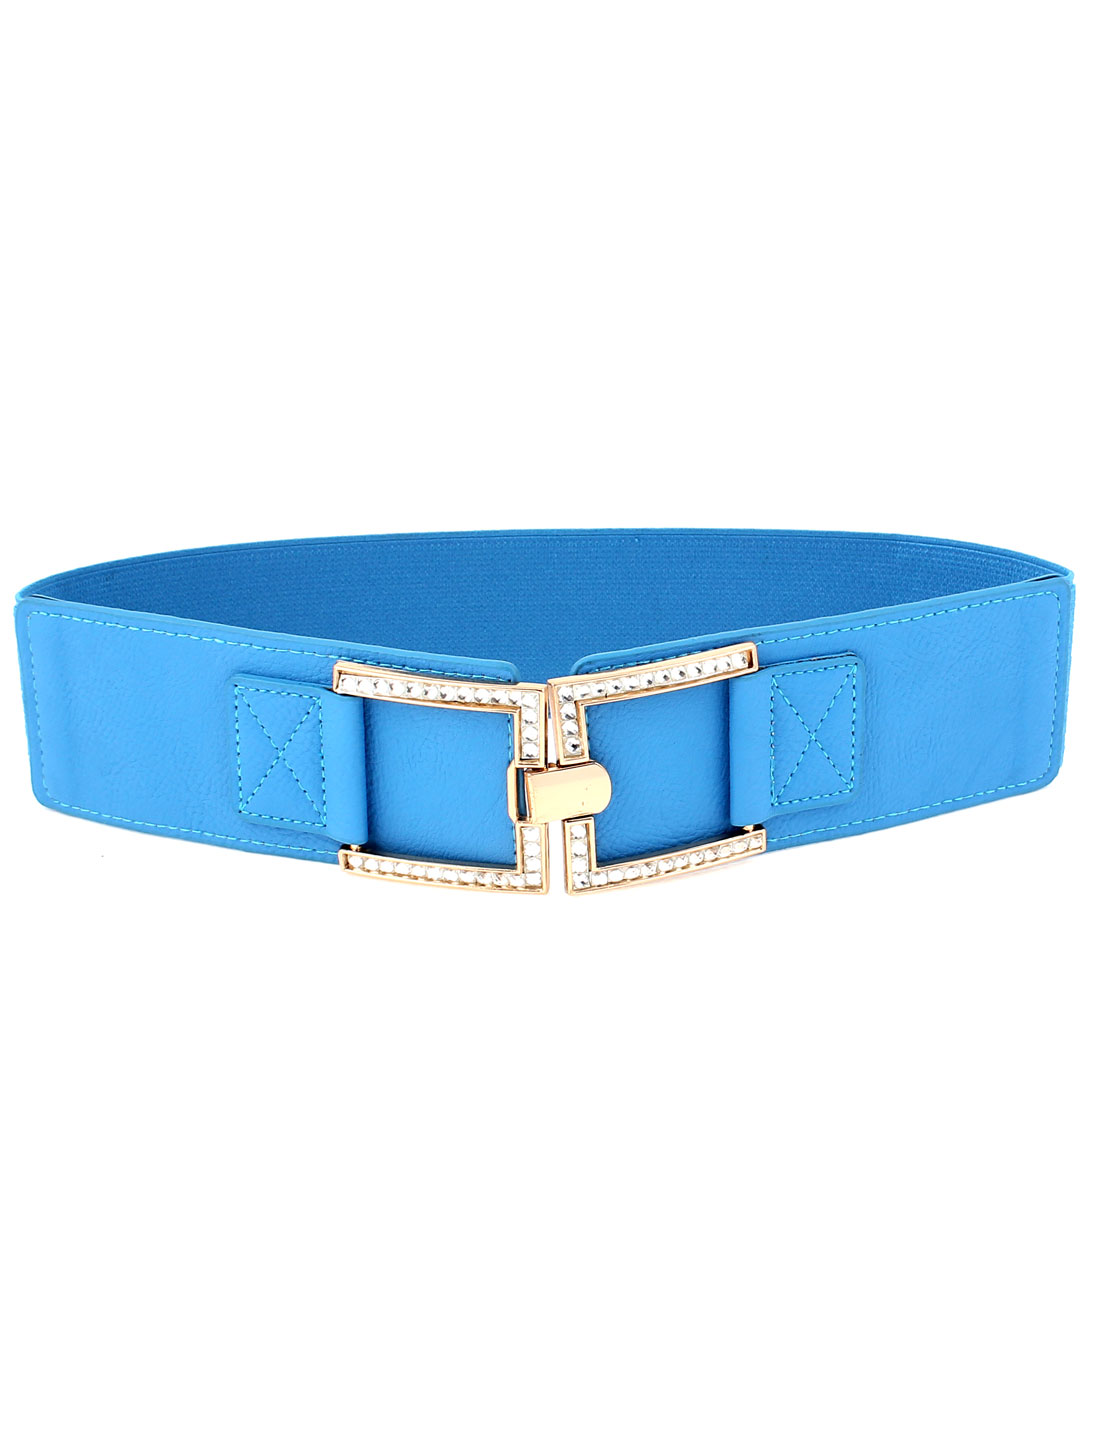 Women Metal Hook Buckle Wide Elastic Waist Cinch Belt Band Blue